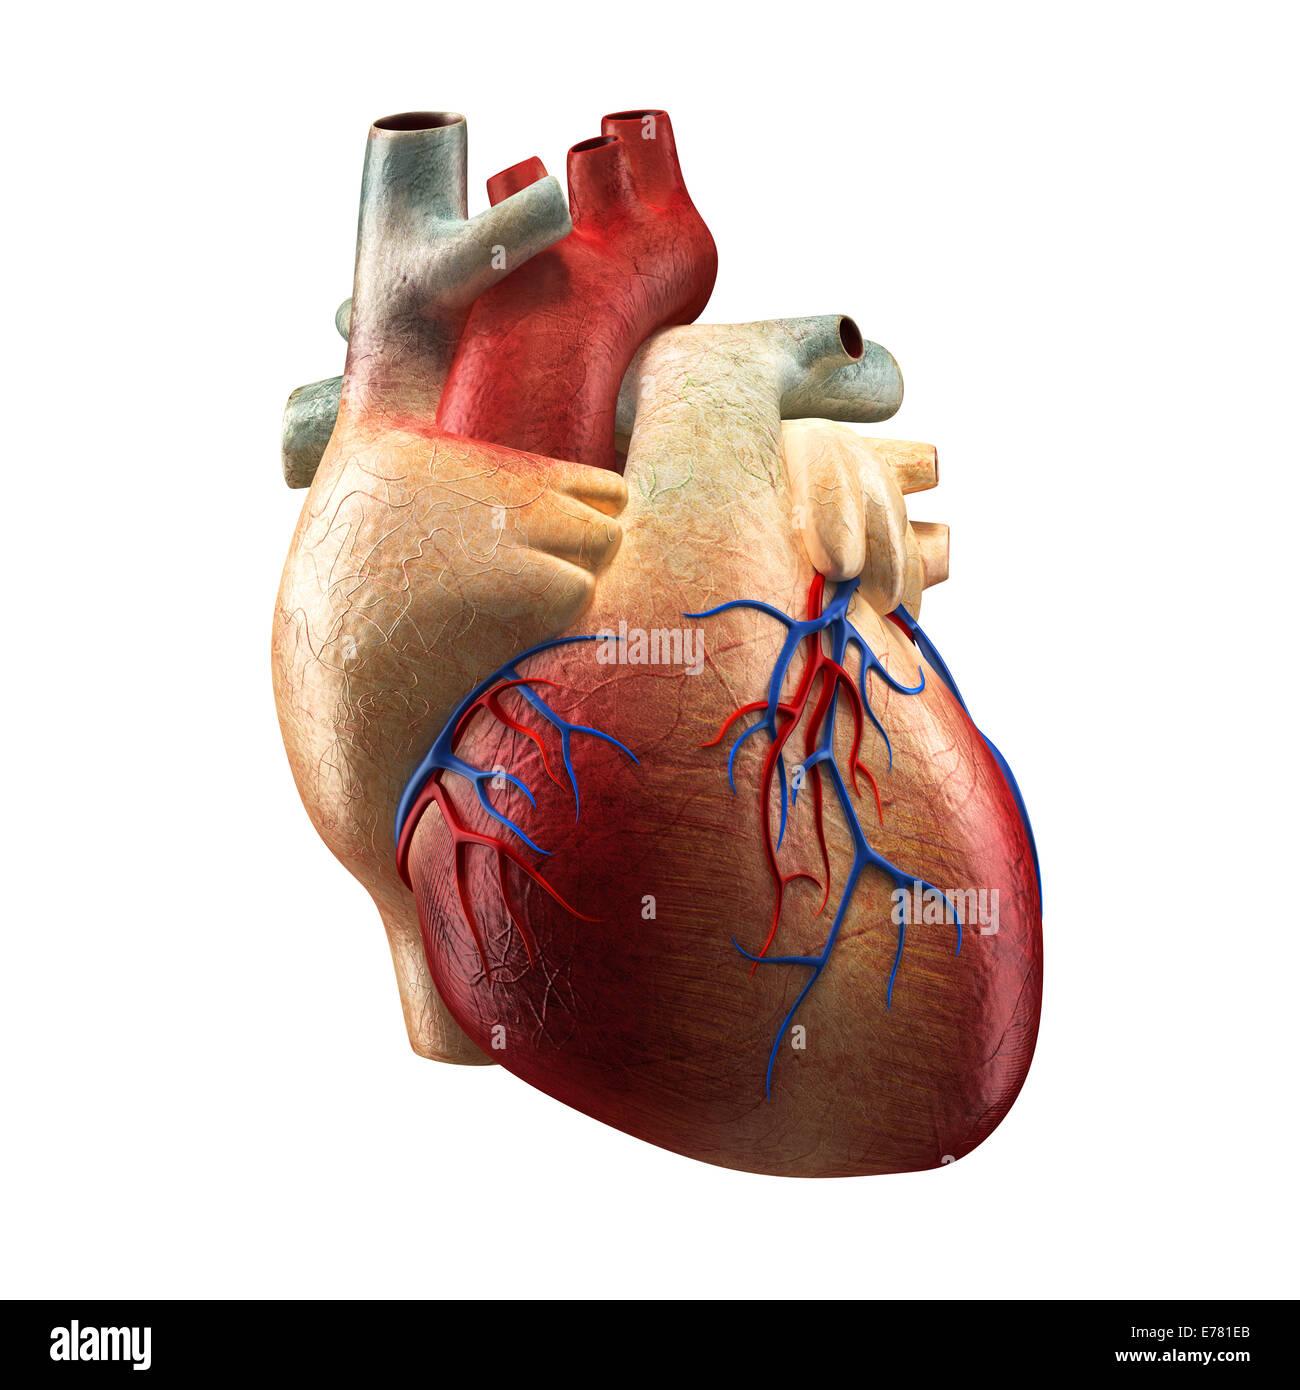 Real Heart Human Anatomy Model Stock Photo 73320867 Alamy